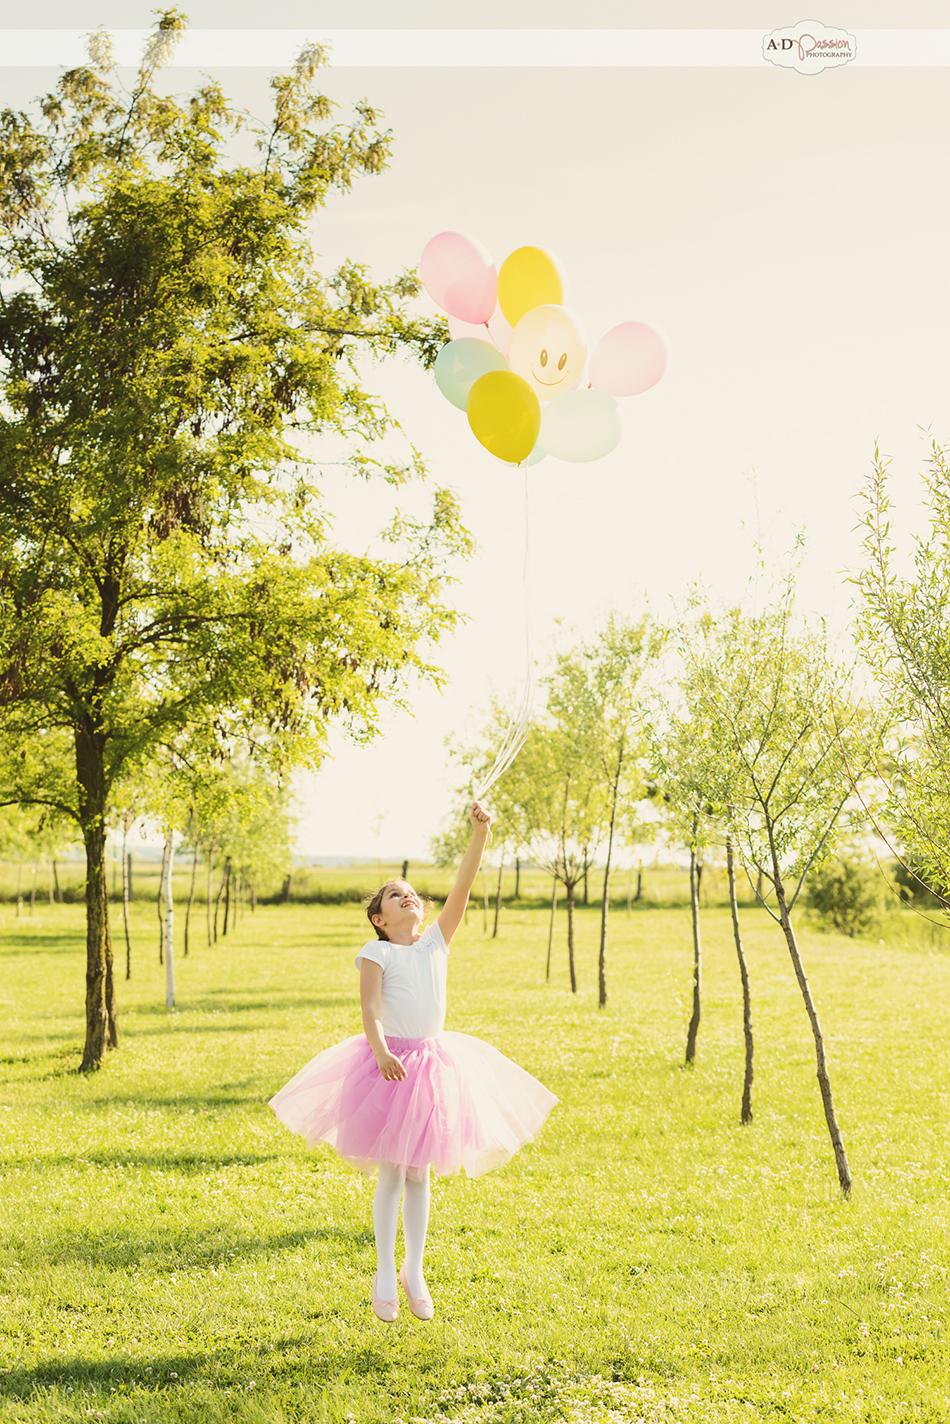 AD Passion Photography | party-fetite-fotograf-copii-timisoara_0027 | Adelin, Dida, fotograf profesionist, fotograf de nunta, fotografie de nunta, fotograf Timisoara, fotograf Craiova, fotograf Bucuresti, fotograf Arad, nunta Timisoara, nunta Arad, nunta Bucuresti, nunta Craiova